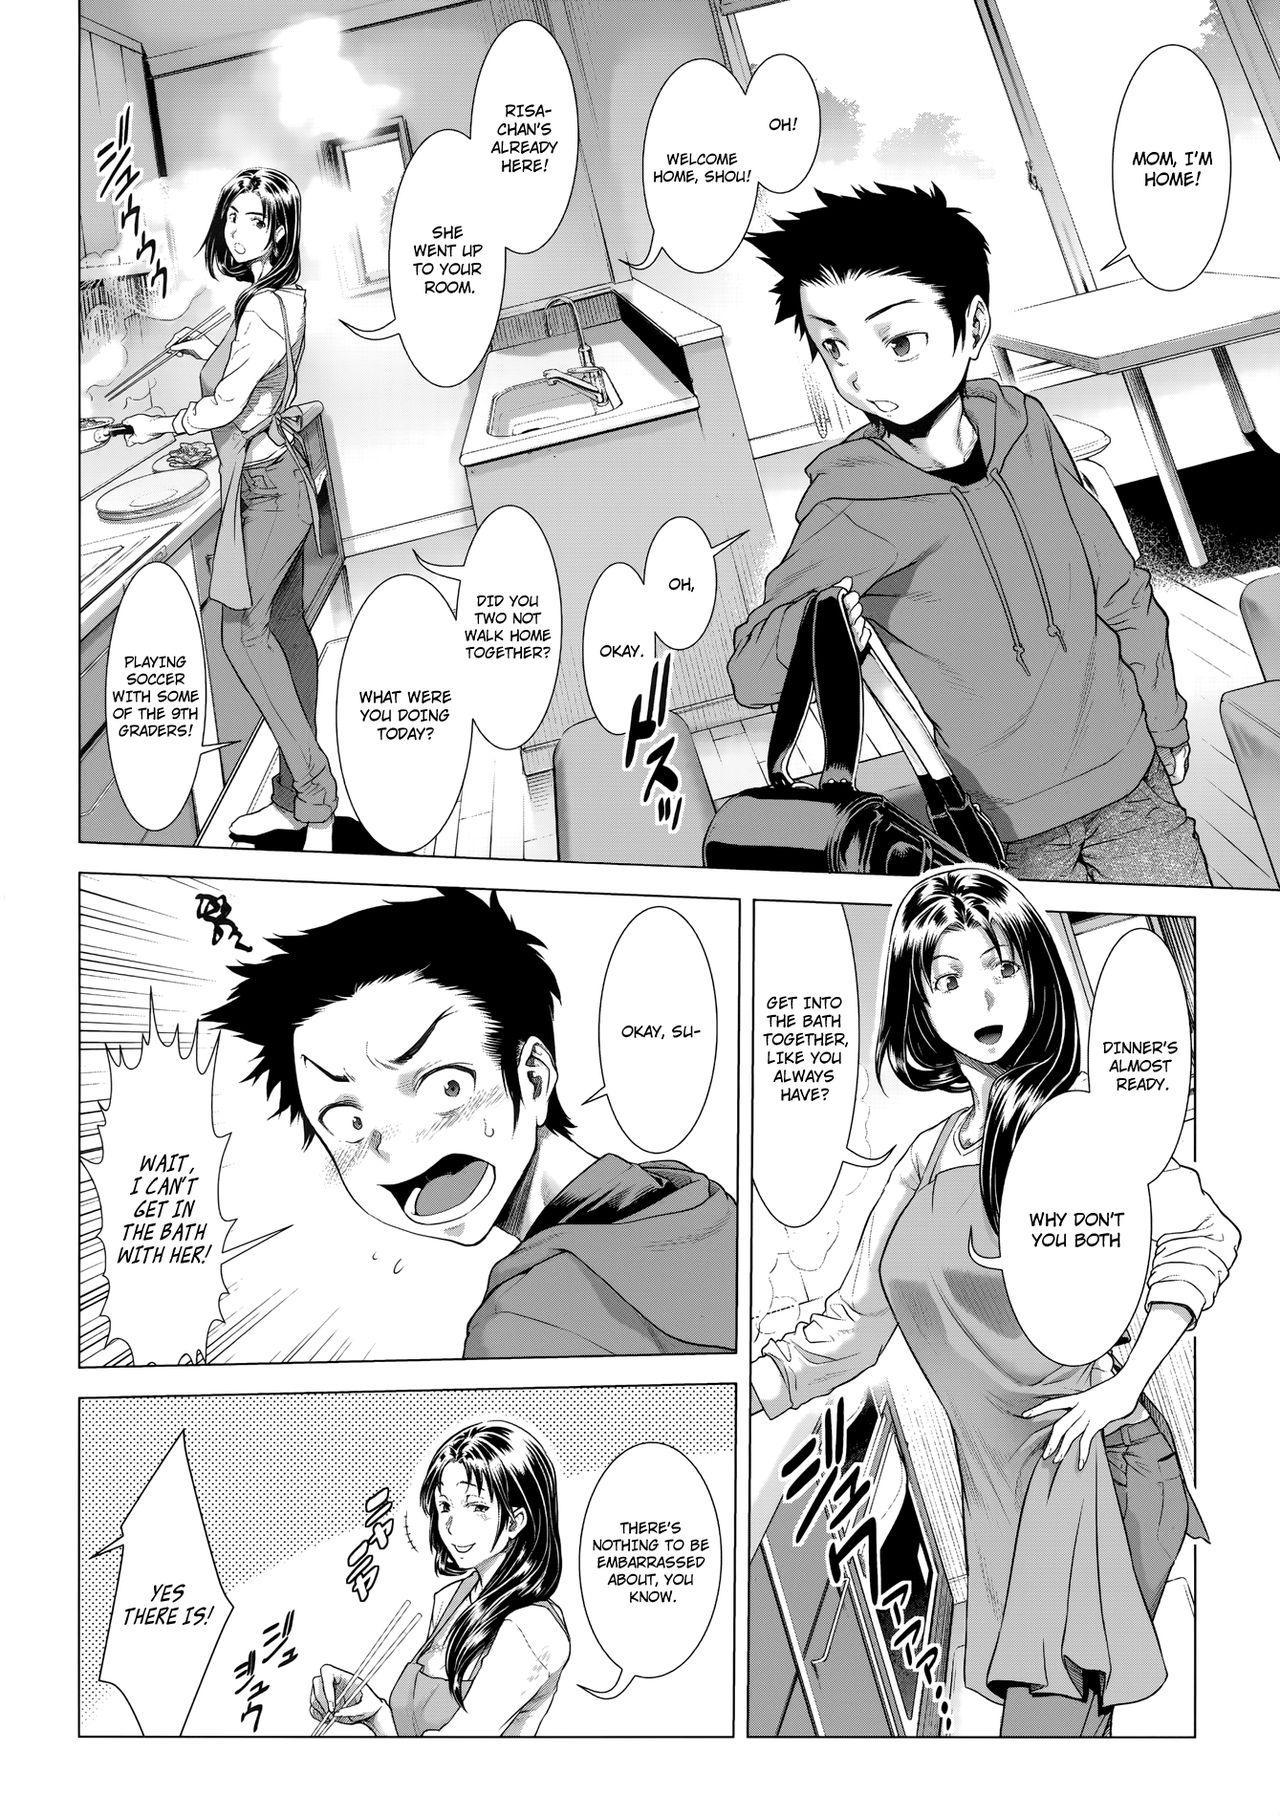 [Sannyuutei Shinta] Chinpotsuki Ijimerarekko | «Dickgirl!», The Bullying Story - Ch. 1-4 [English] [34th squad] 71